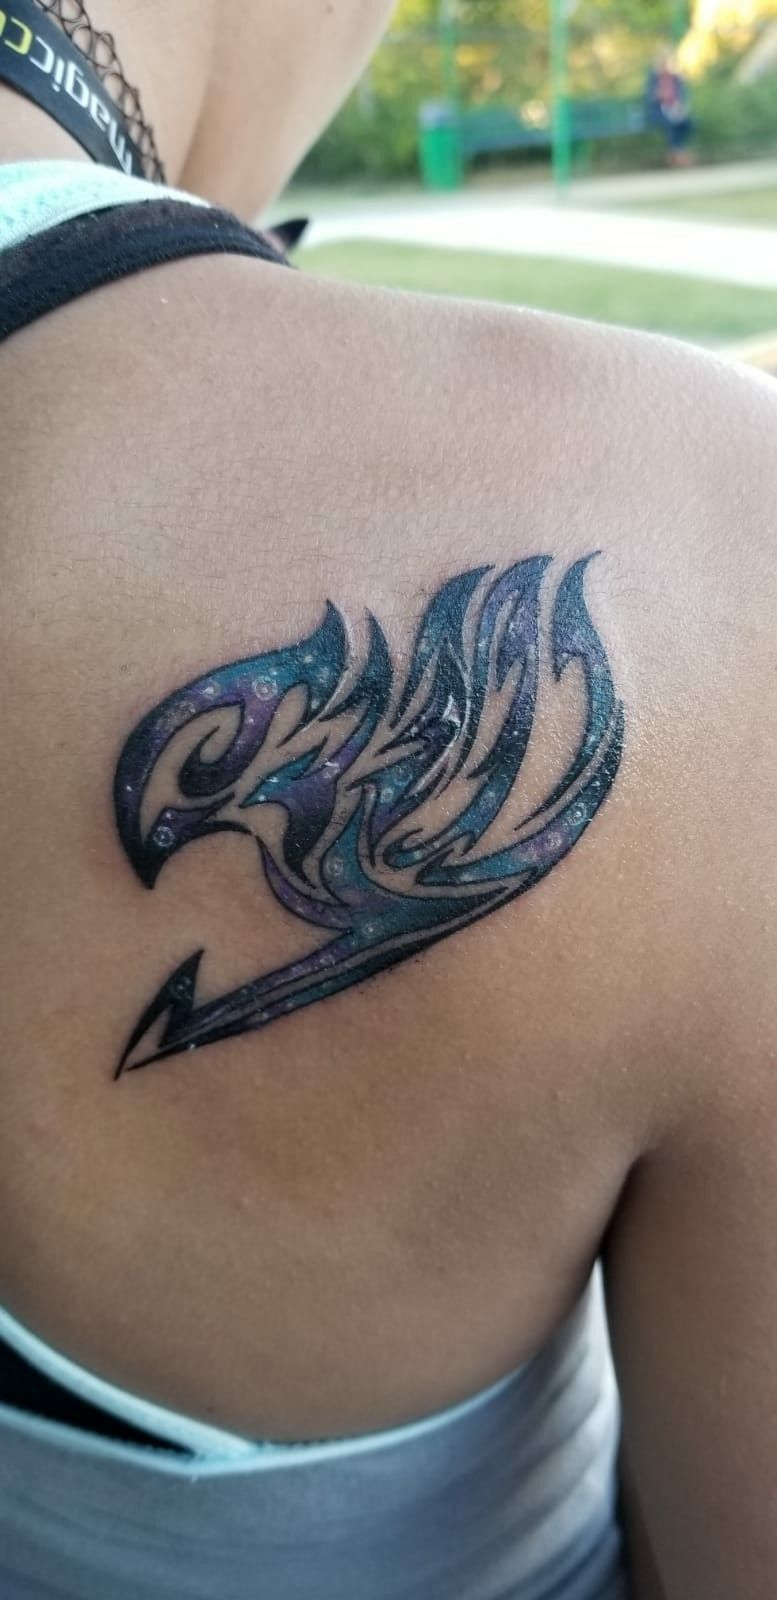 Small Simple Bioshock Tattoo Designs (205)